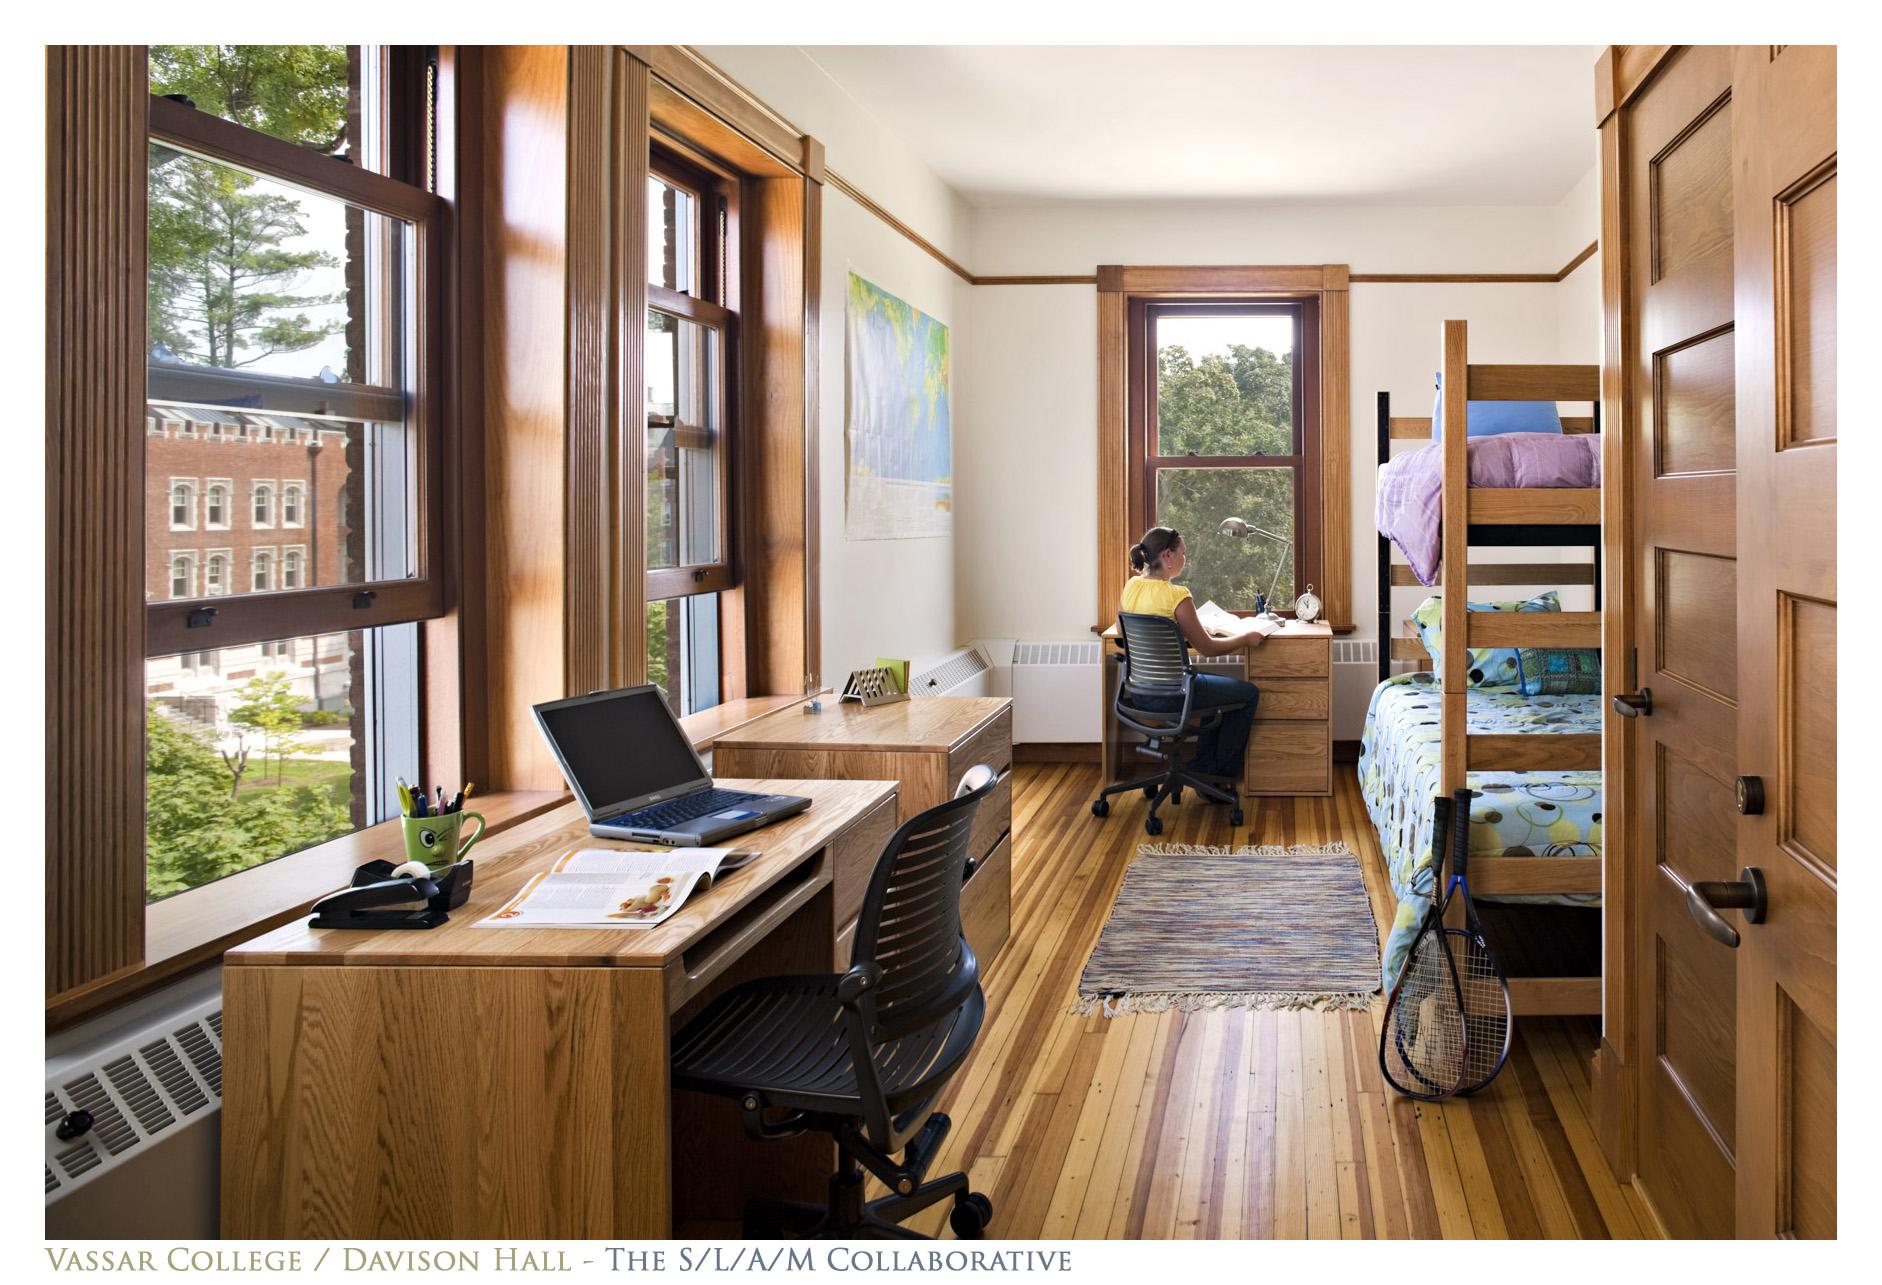 060_Robert-Benson-Photography-SLAM-Collaborative-Vassar-Davison-Hall-05.JPG